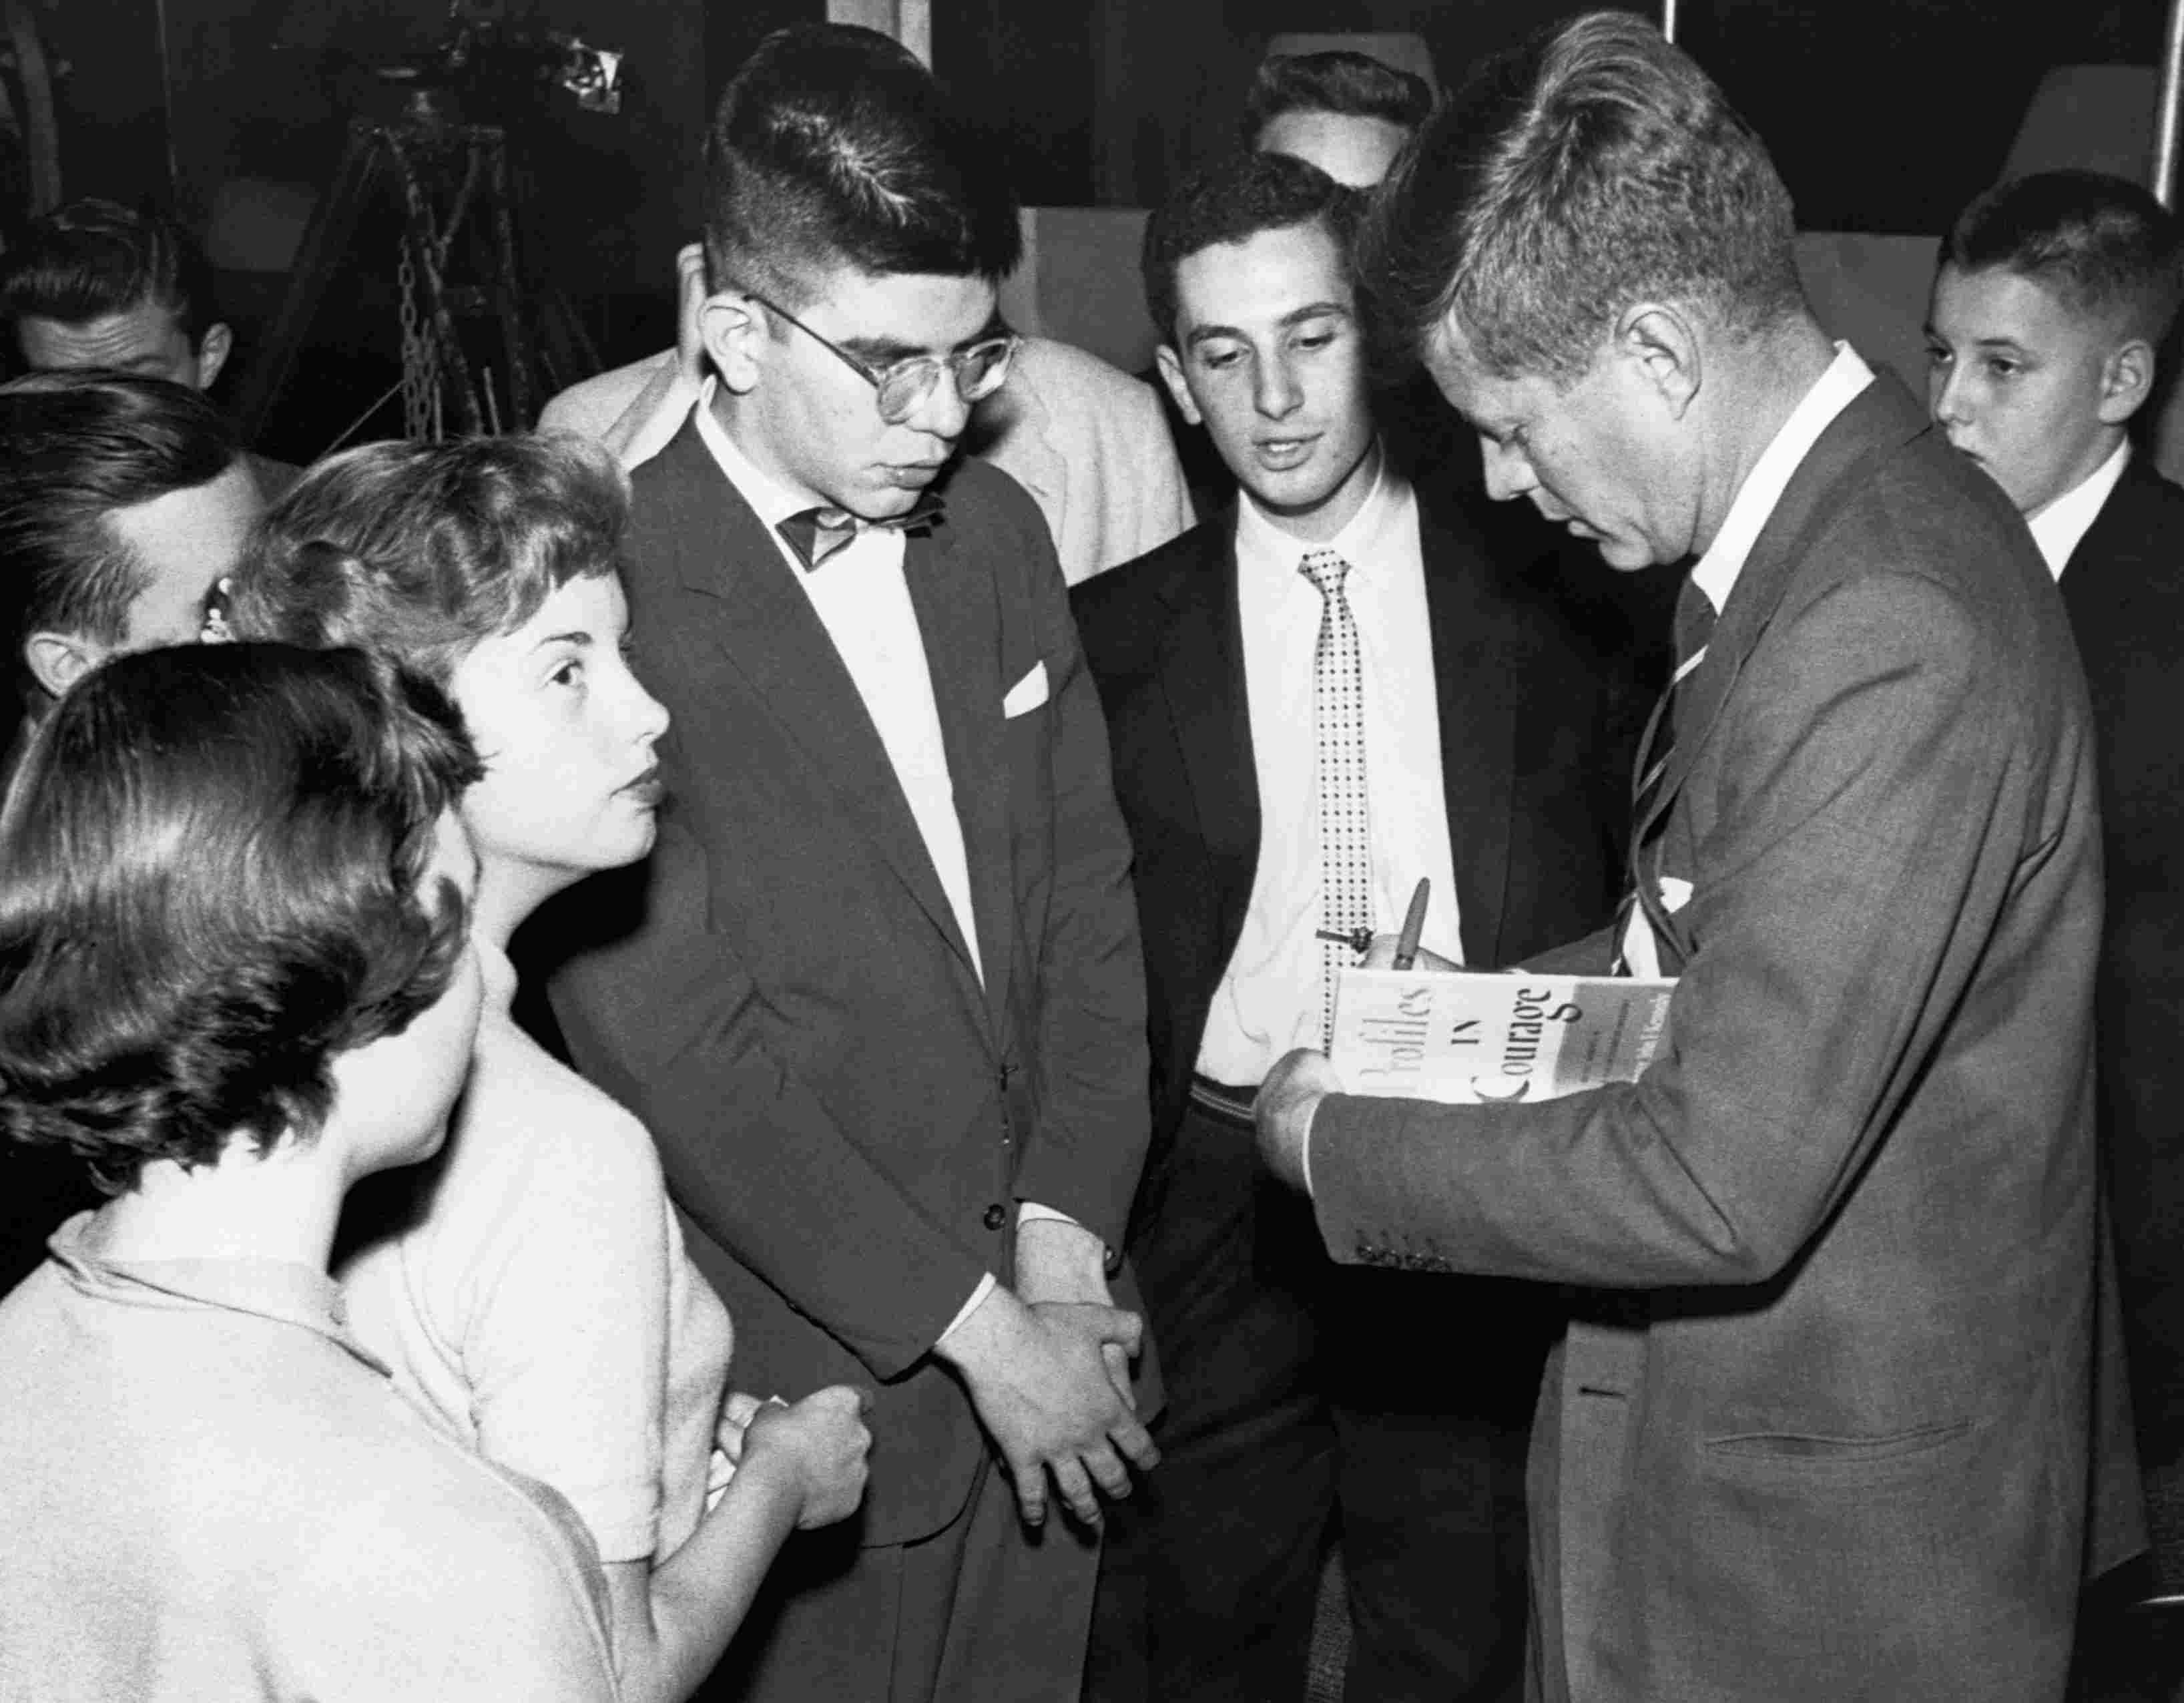 Senator John Kennedy Signing Copies of Profiles in Courage